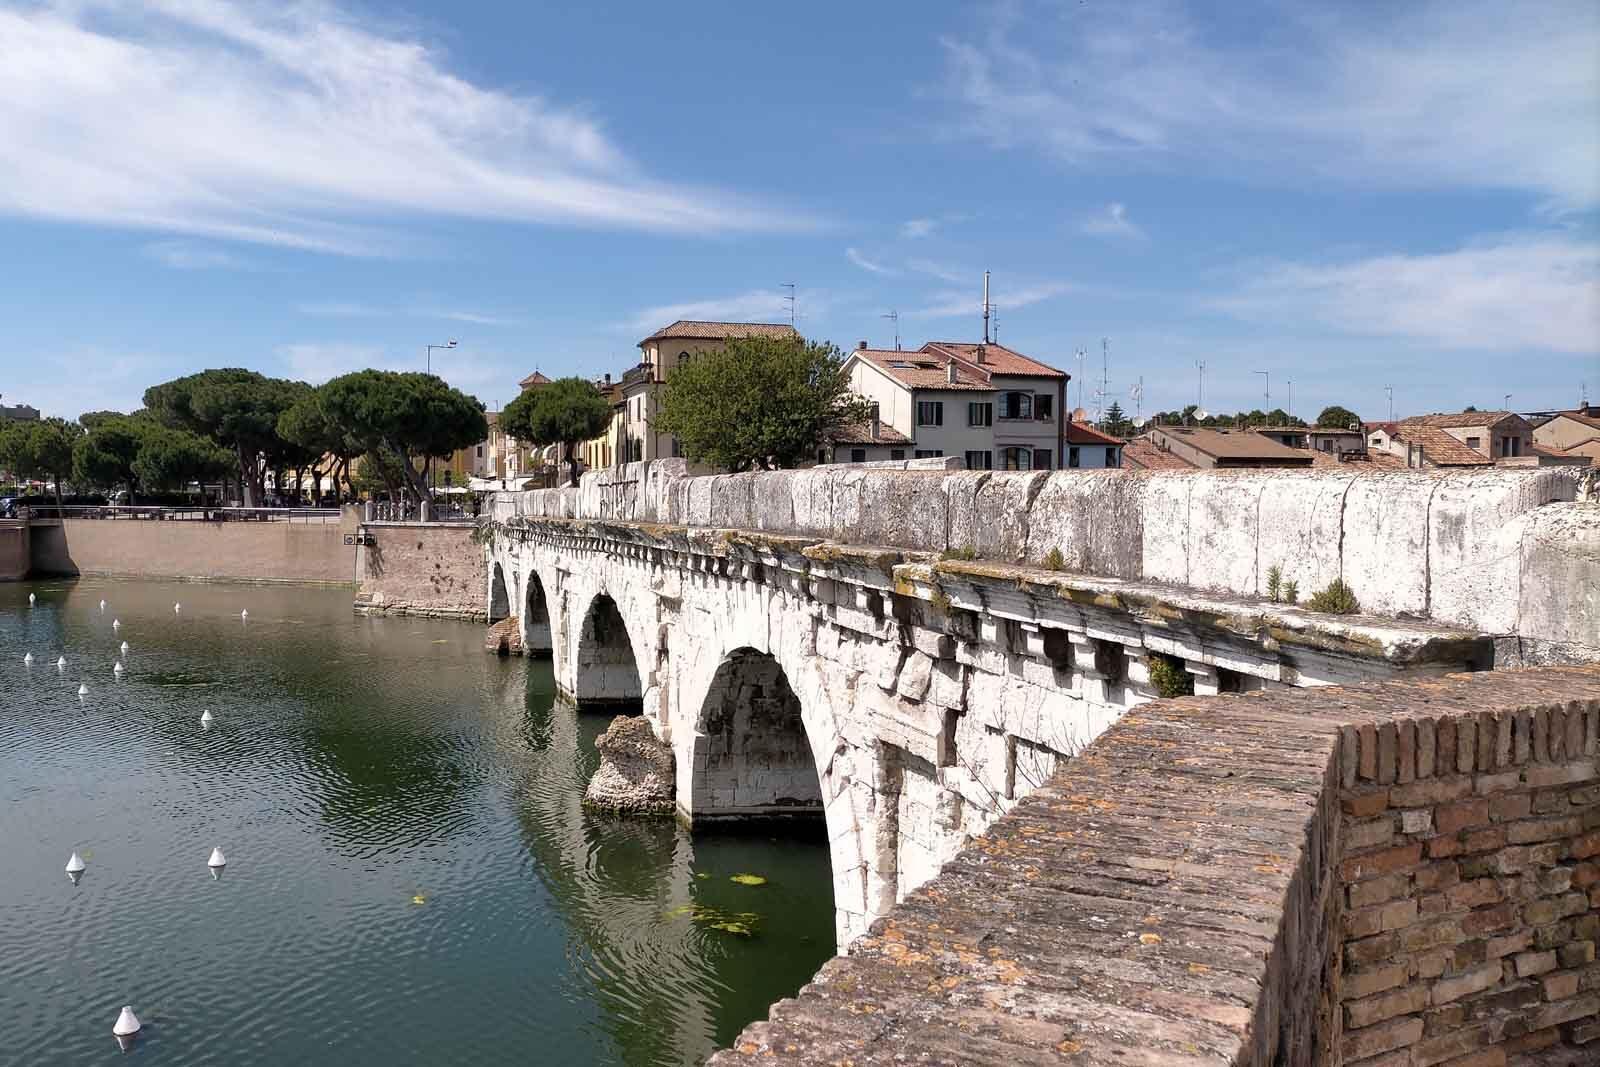 Dieses Bild hat ein leeres Alt-Attribut. Der Dateiname ist 053-Italien-2021-Rimini-ponte-di-tiberio-1600x1067.jpg